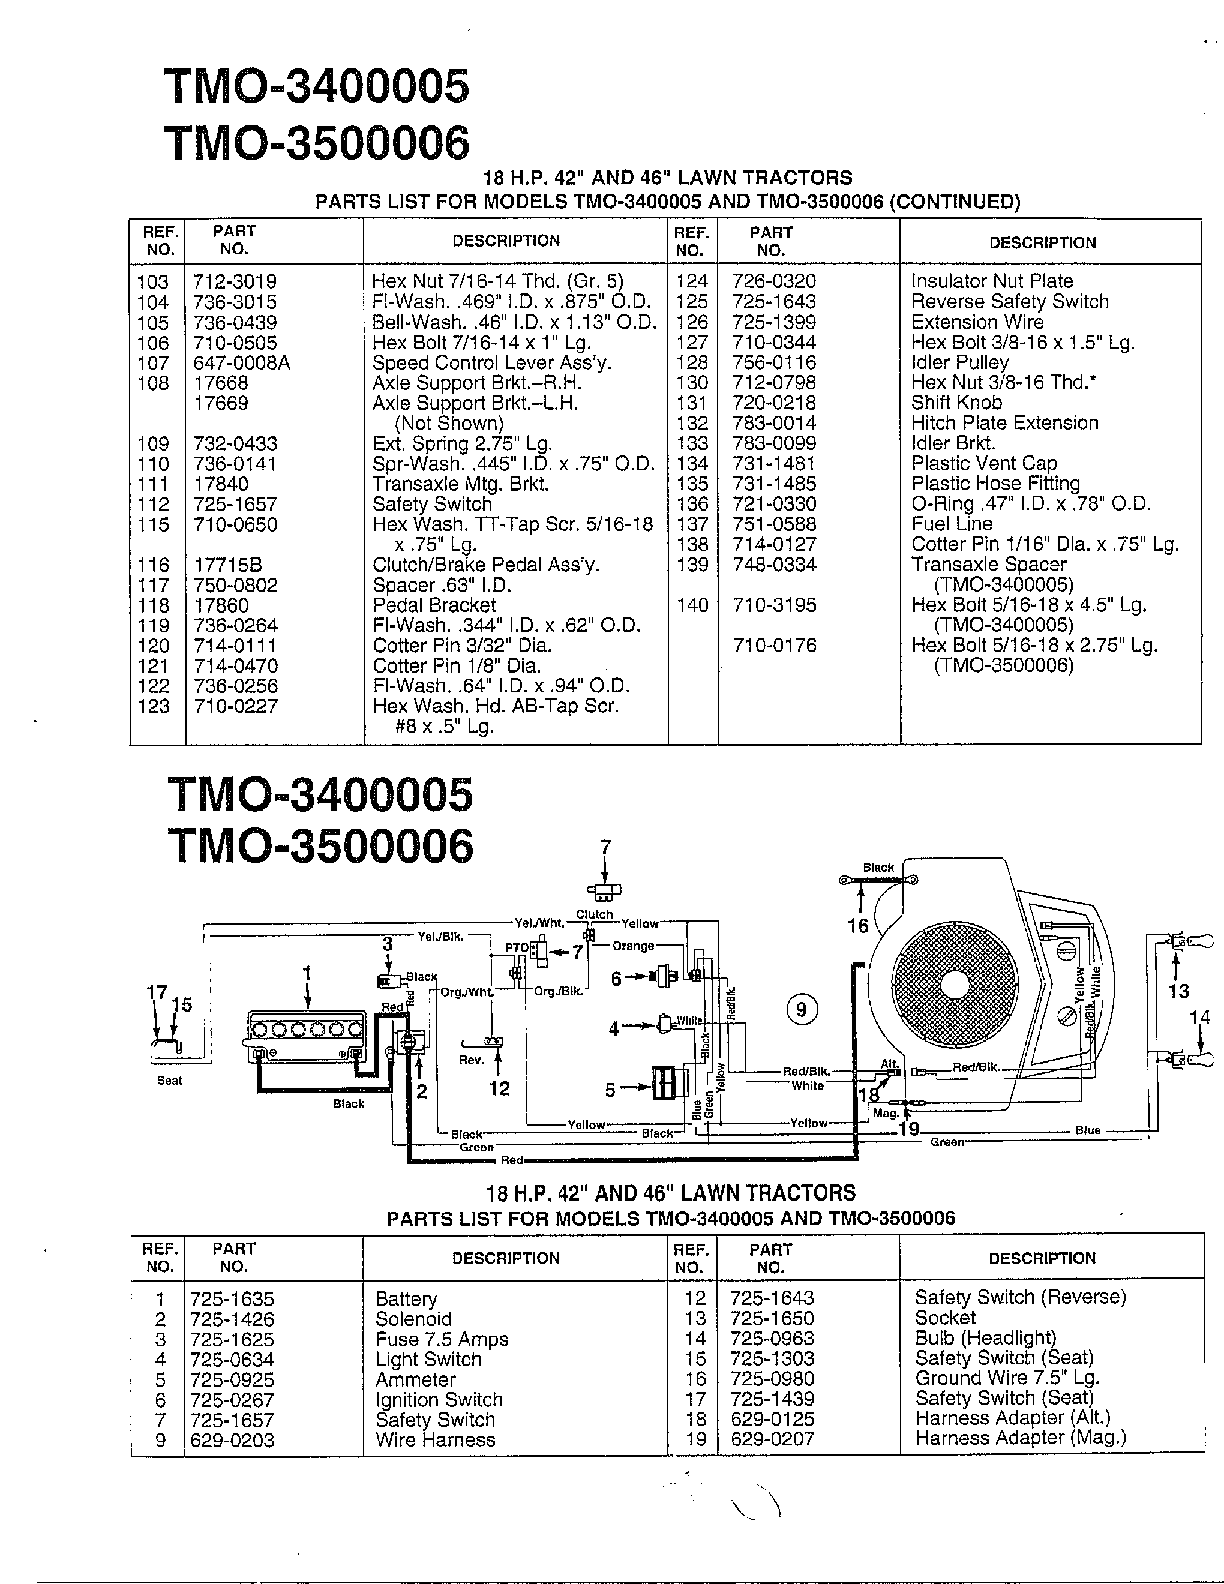 [QMVU_8575]  SN_7260] Wiring Diagram Diagram And Parts List For Murray  Ridingmowertractor Wiring Diagram | Murray 425000x8 Wiring Diagram |  | Spoat Meric Eumqu Capem Mohammedshrine Librar Wiring 101